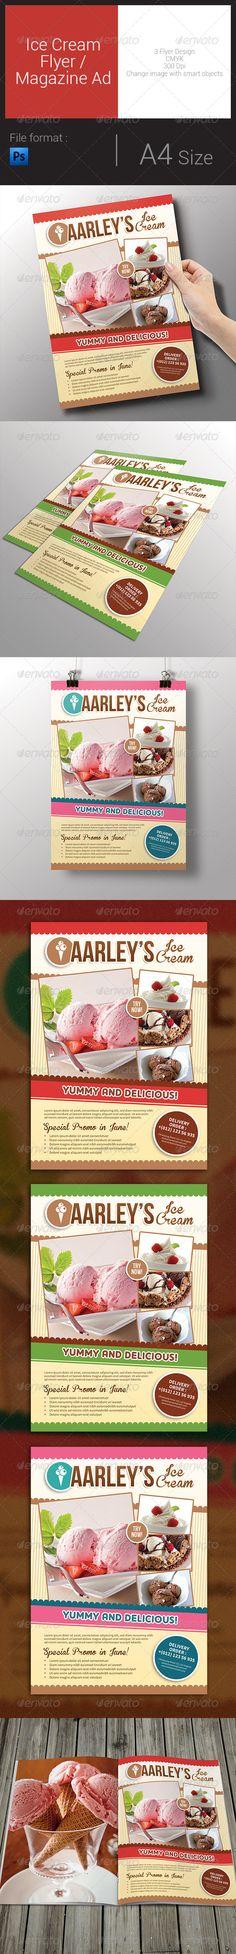 Ice Cream Menu Flyer Ice cream menu, Menu and Flyer template - menu flyer template